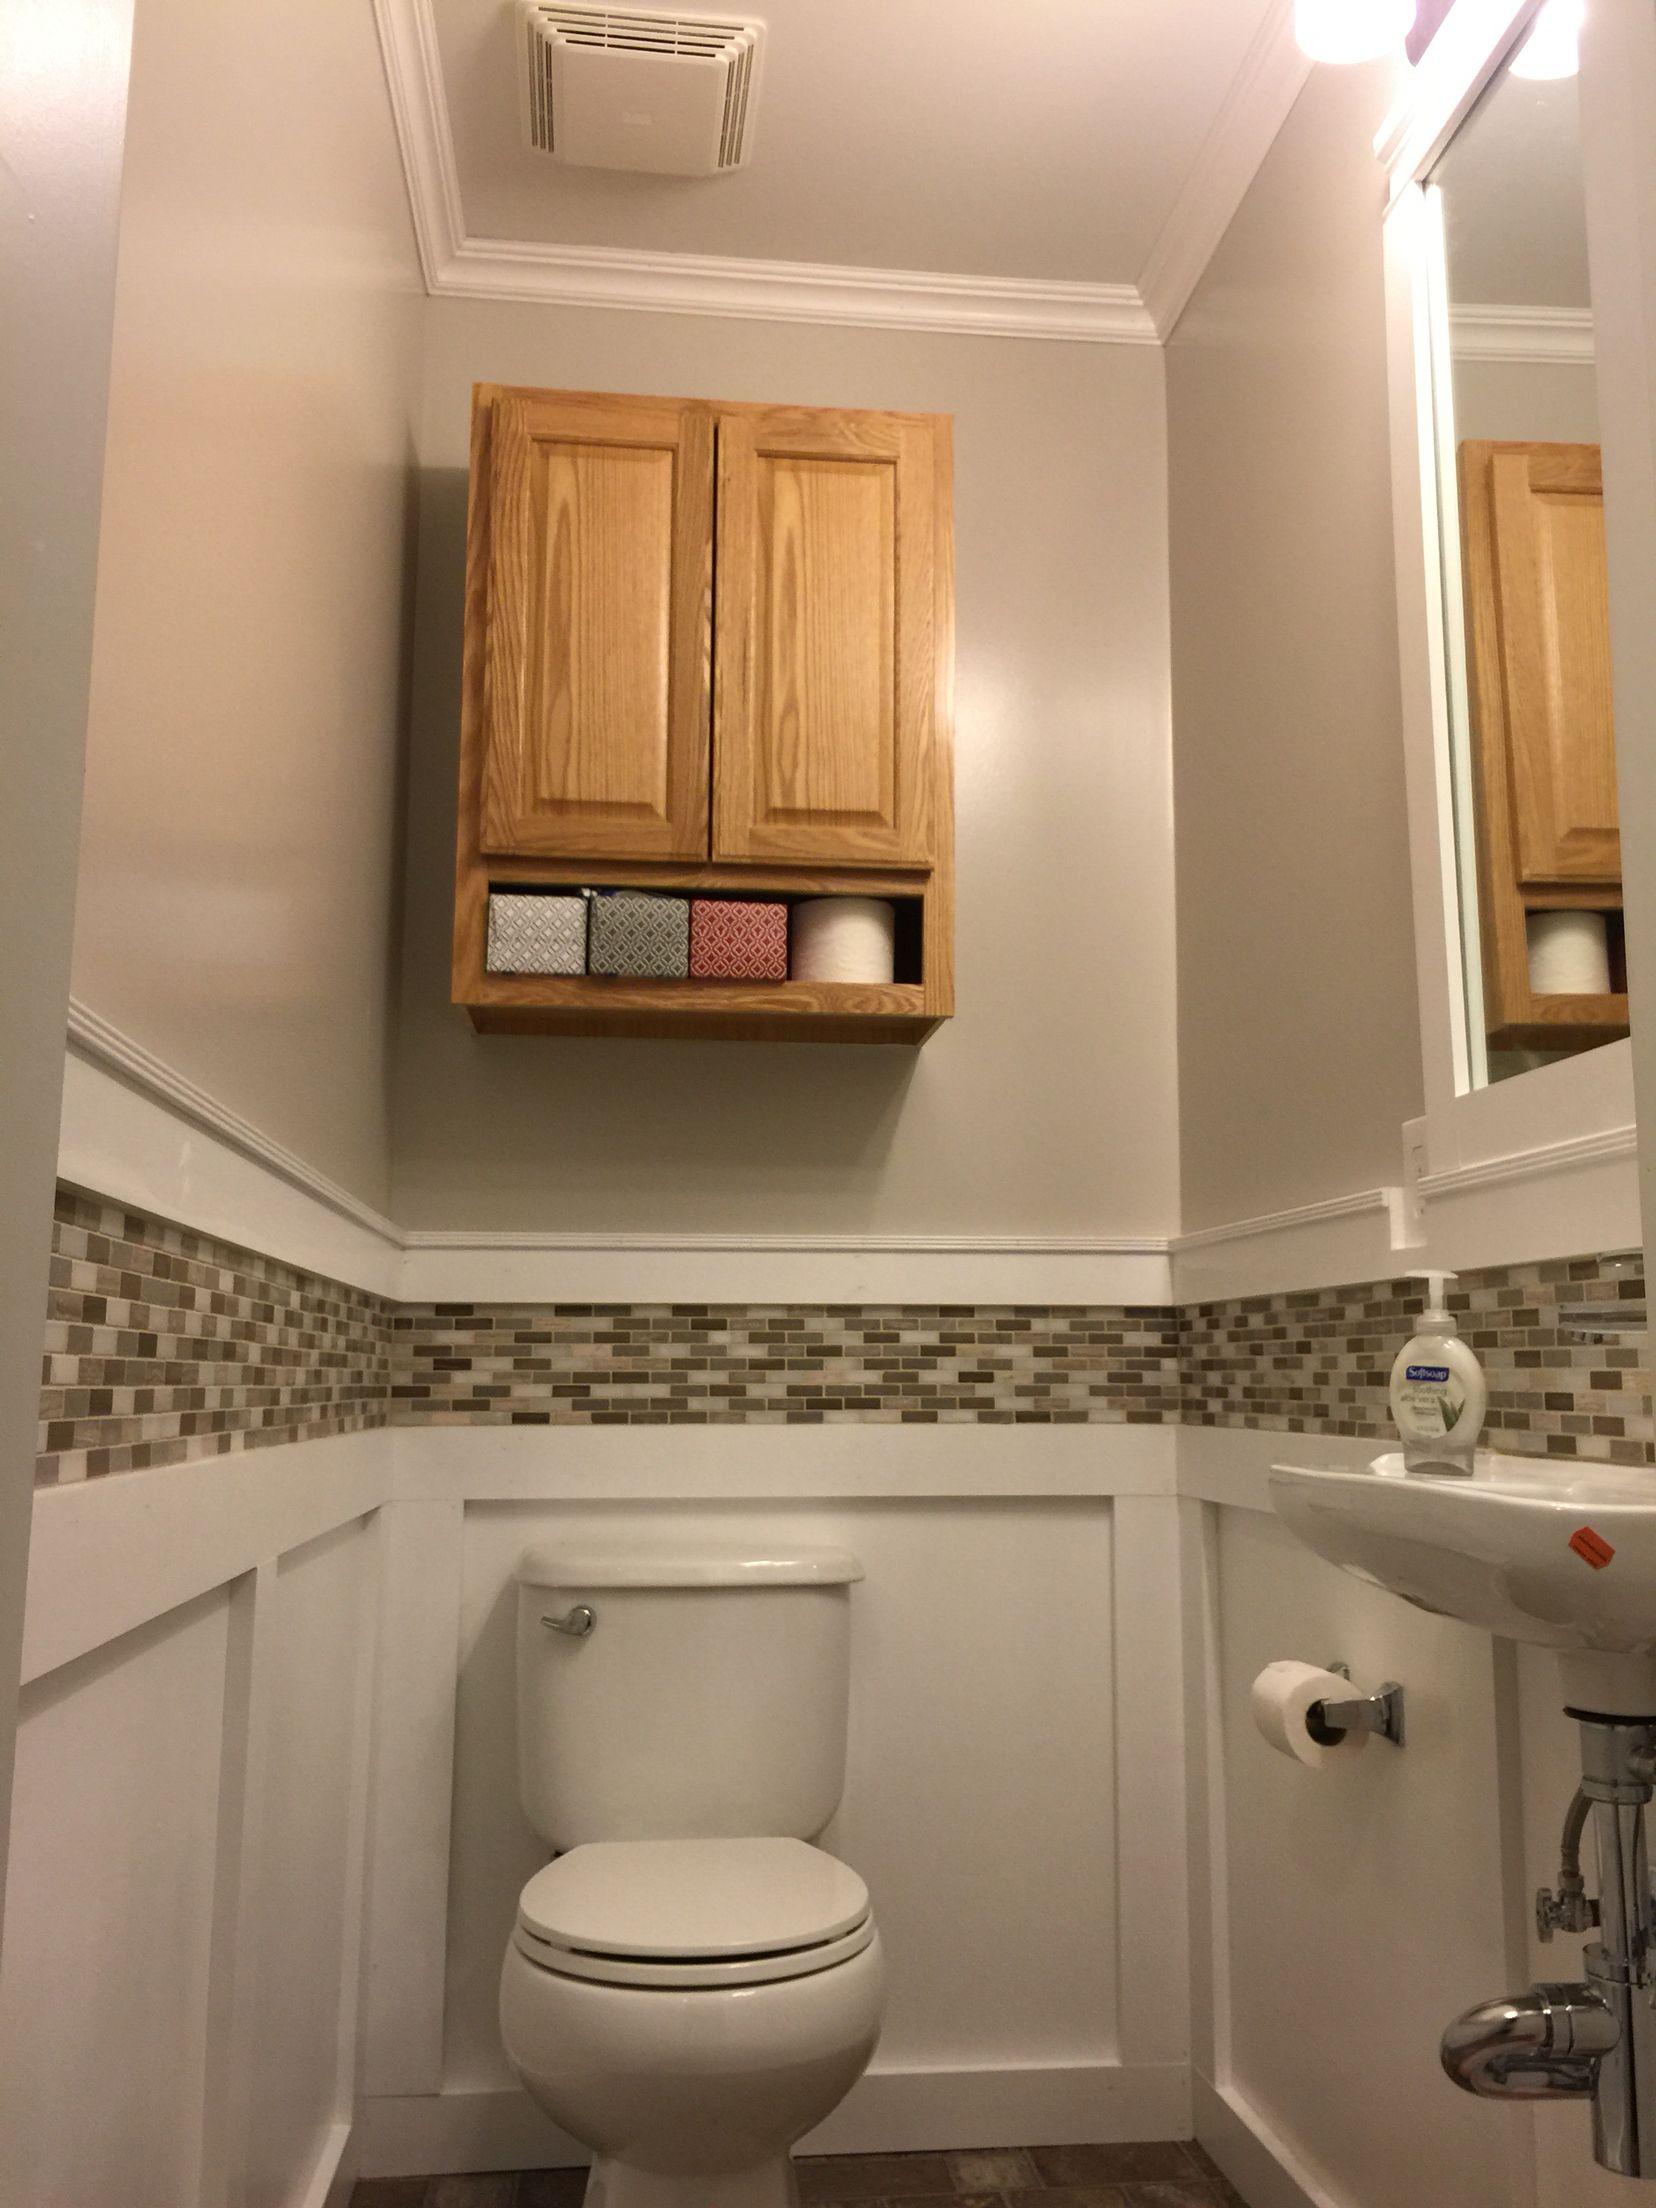 "6x6 Half bath remodel. Sink sticks out 6"" from allmodern.com"